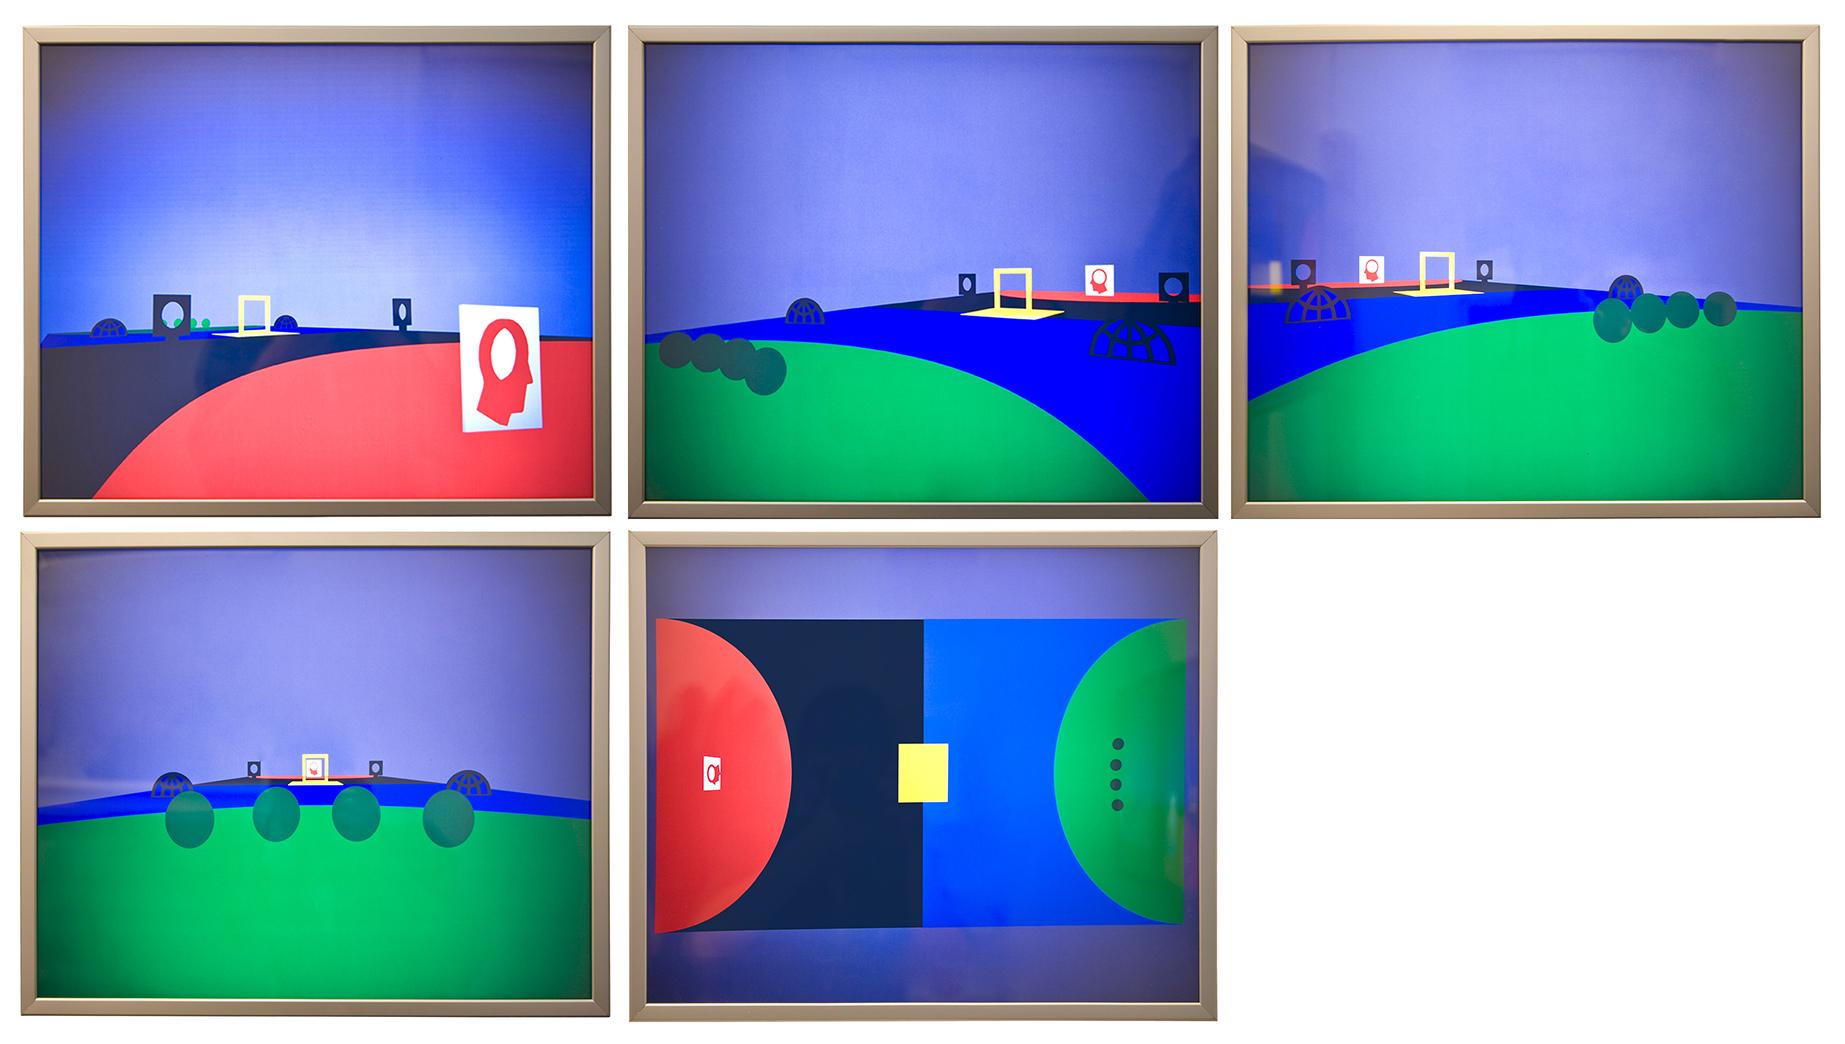 Untitled, 2000 |  | ProjecteSD